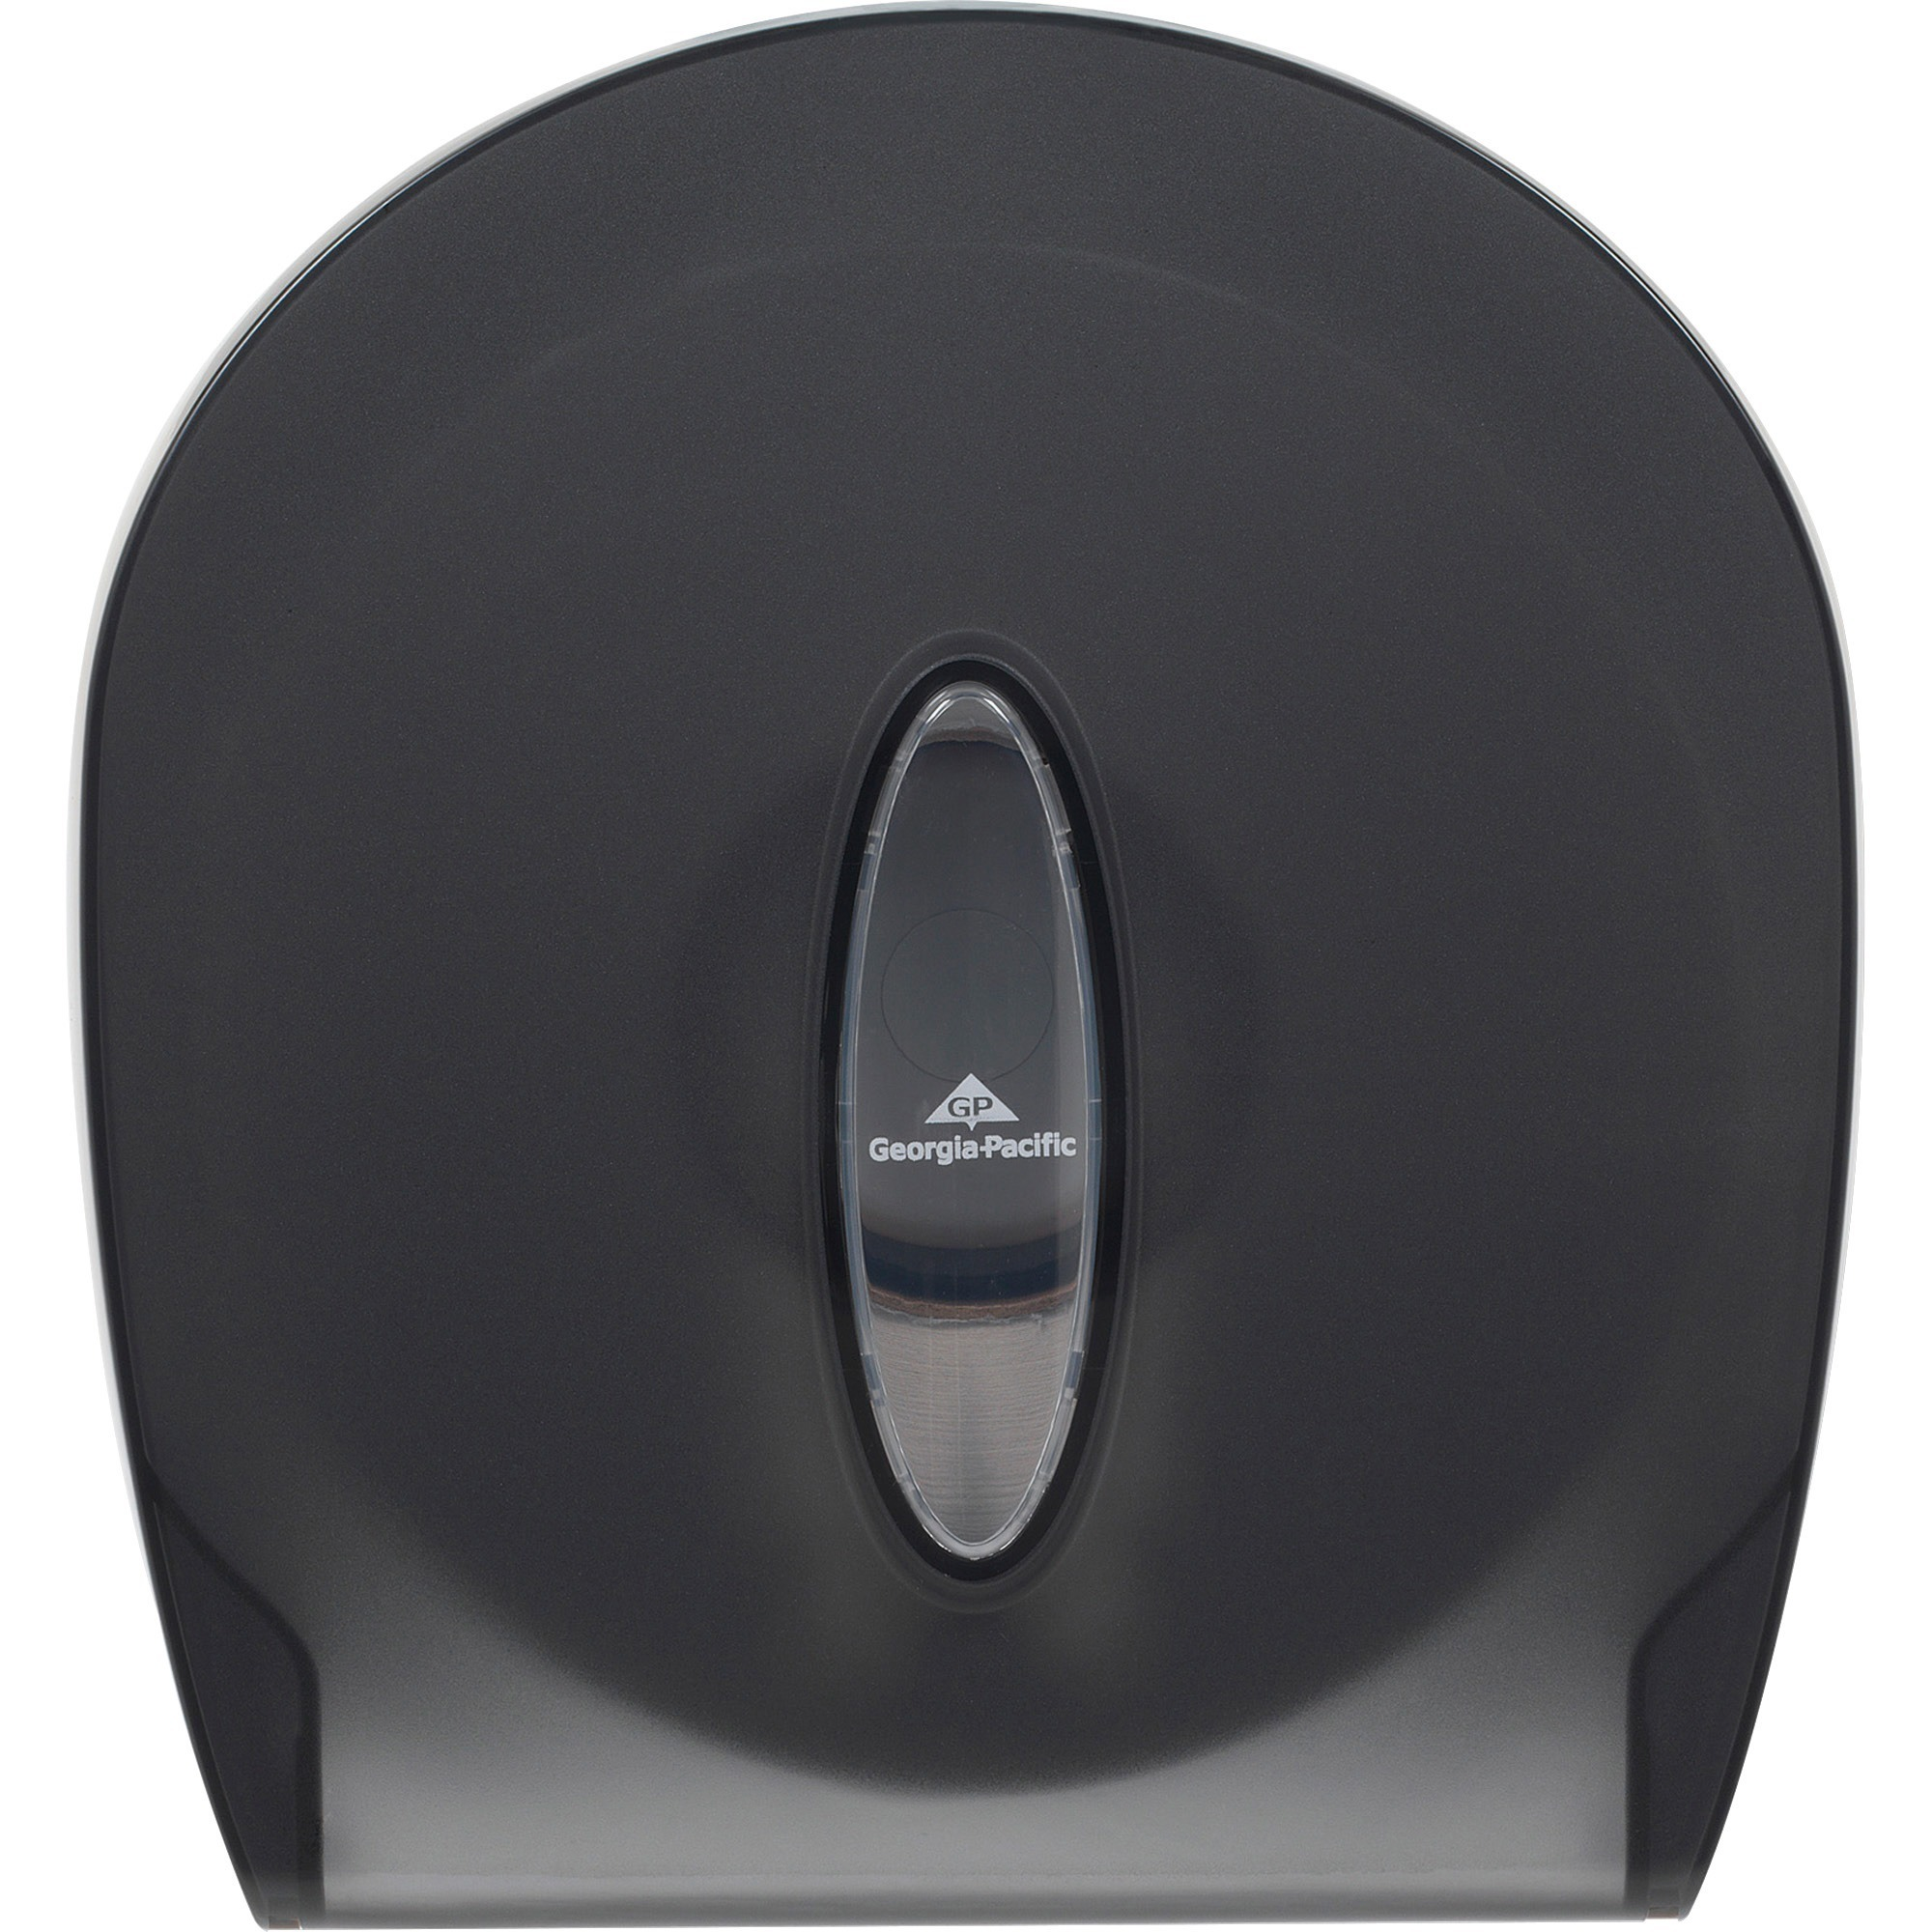 Georgia-Pacific, GPC59009, Jumbo Jr. Bath Tissue Dispenser, 1 Each, Smoke Gray